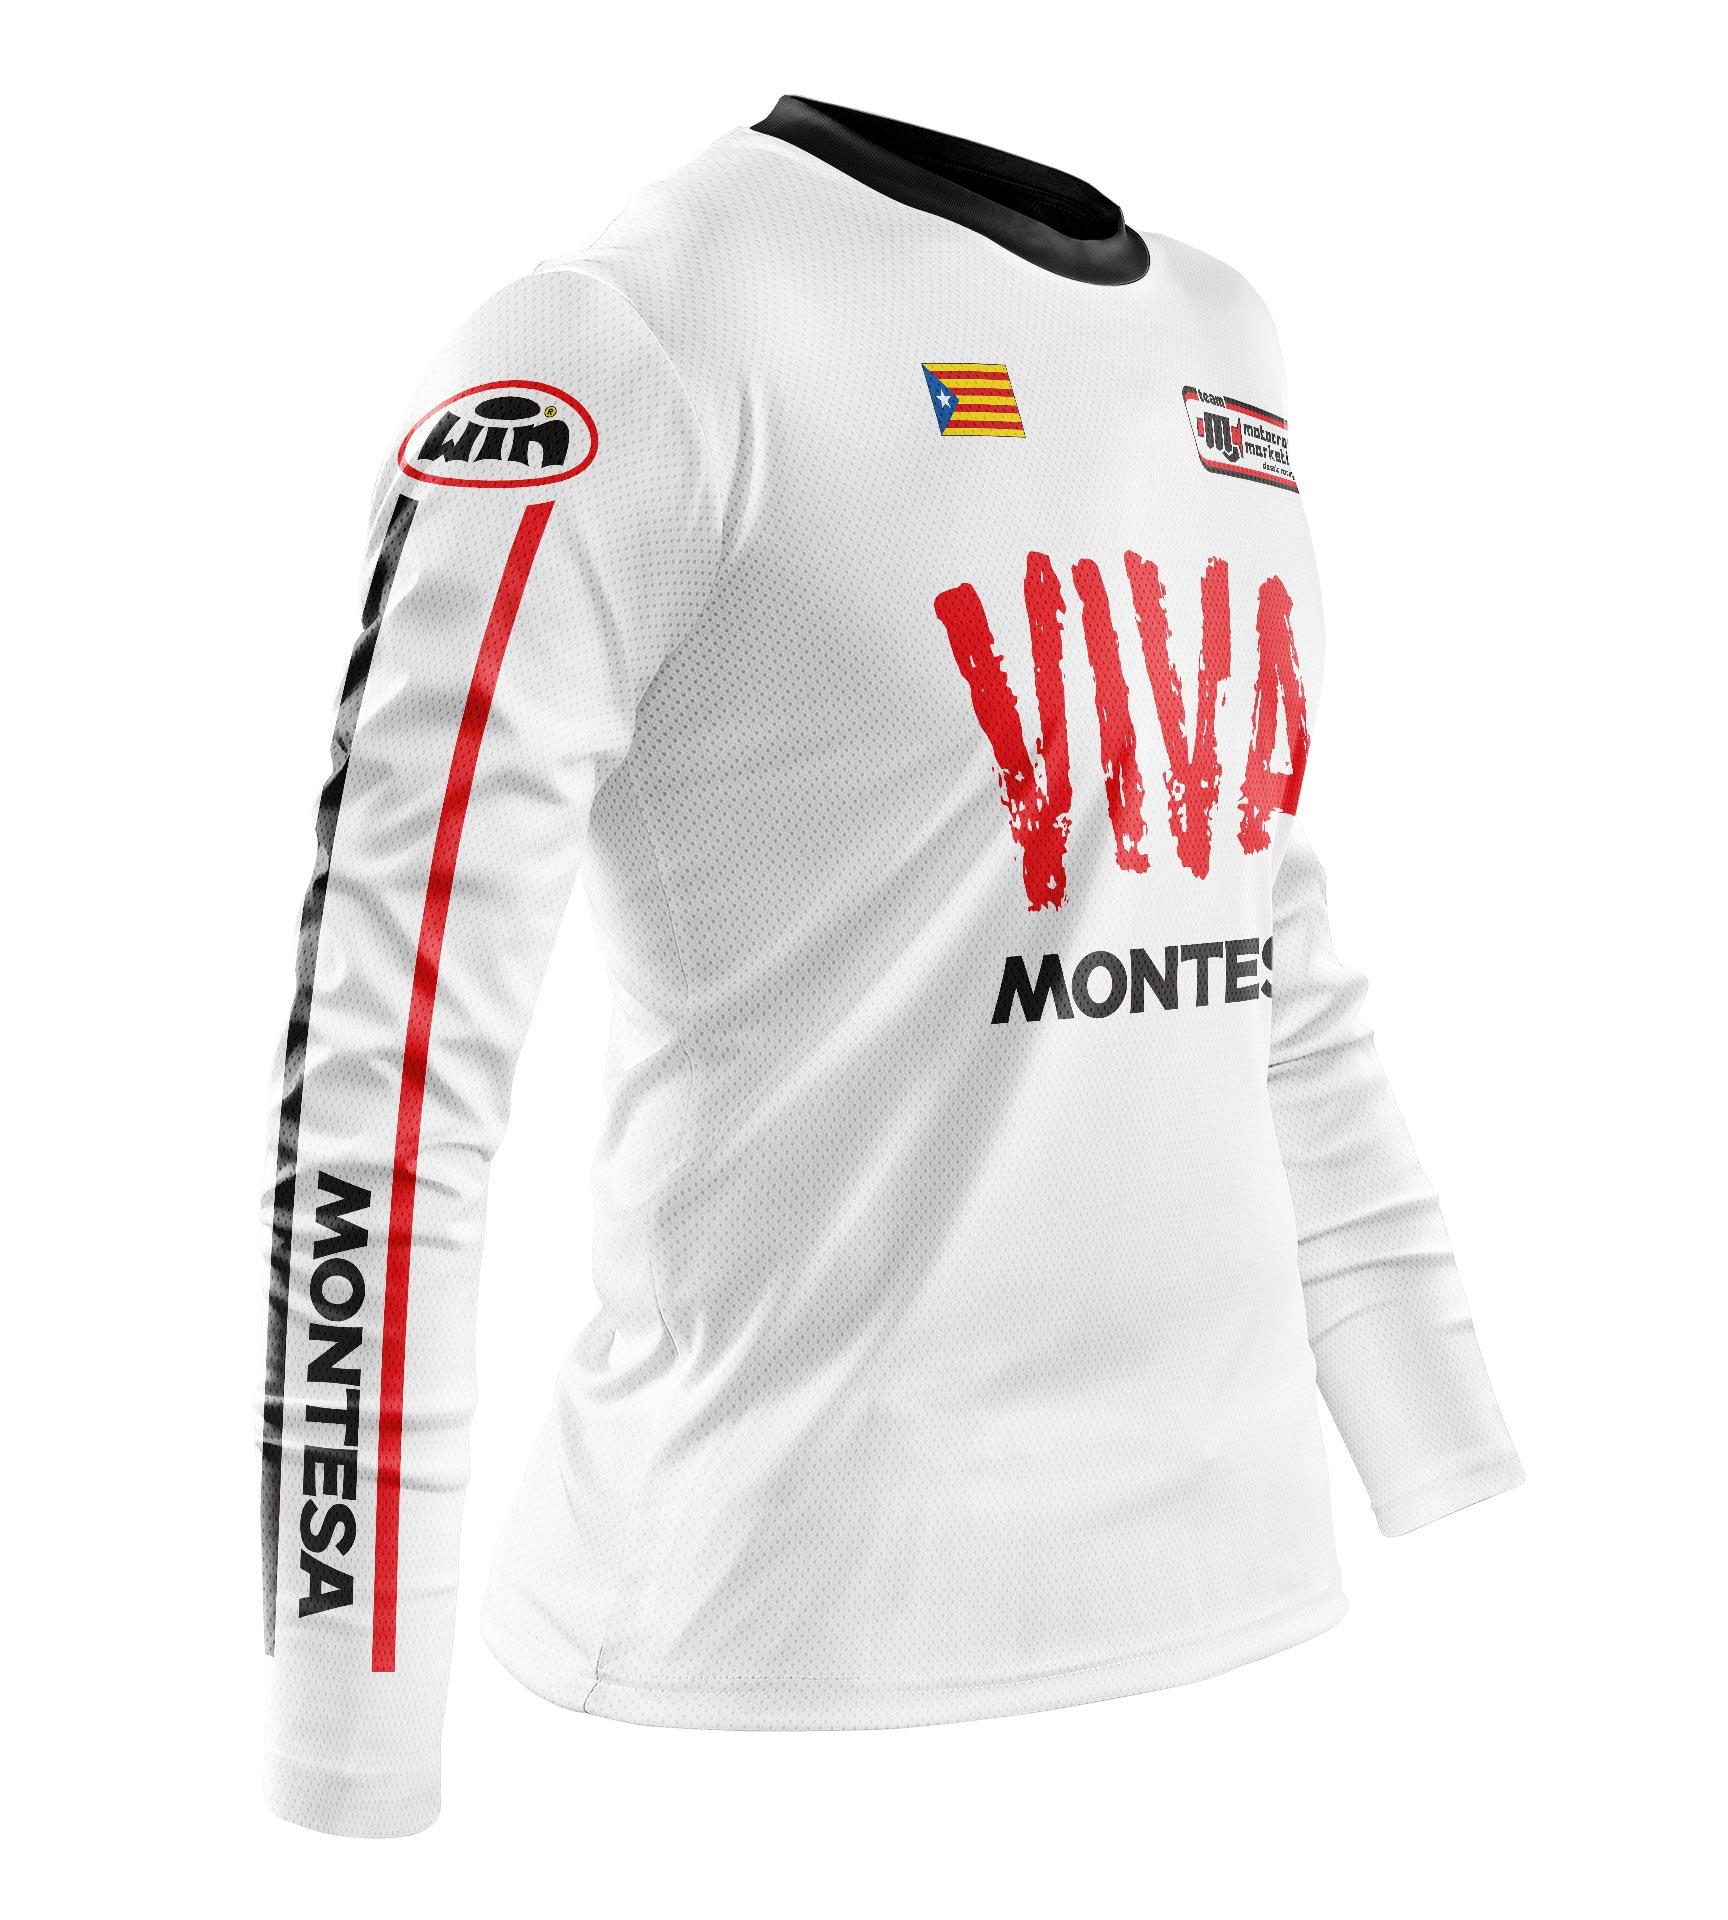 Maillot MONTESA Aéré Blanc Hi Profil